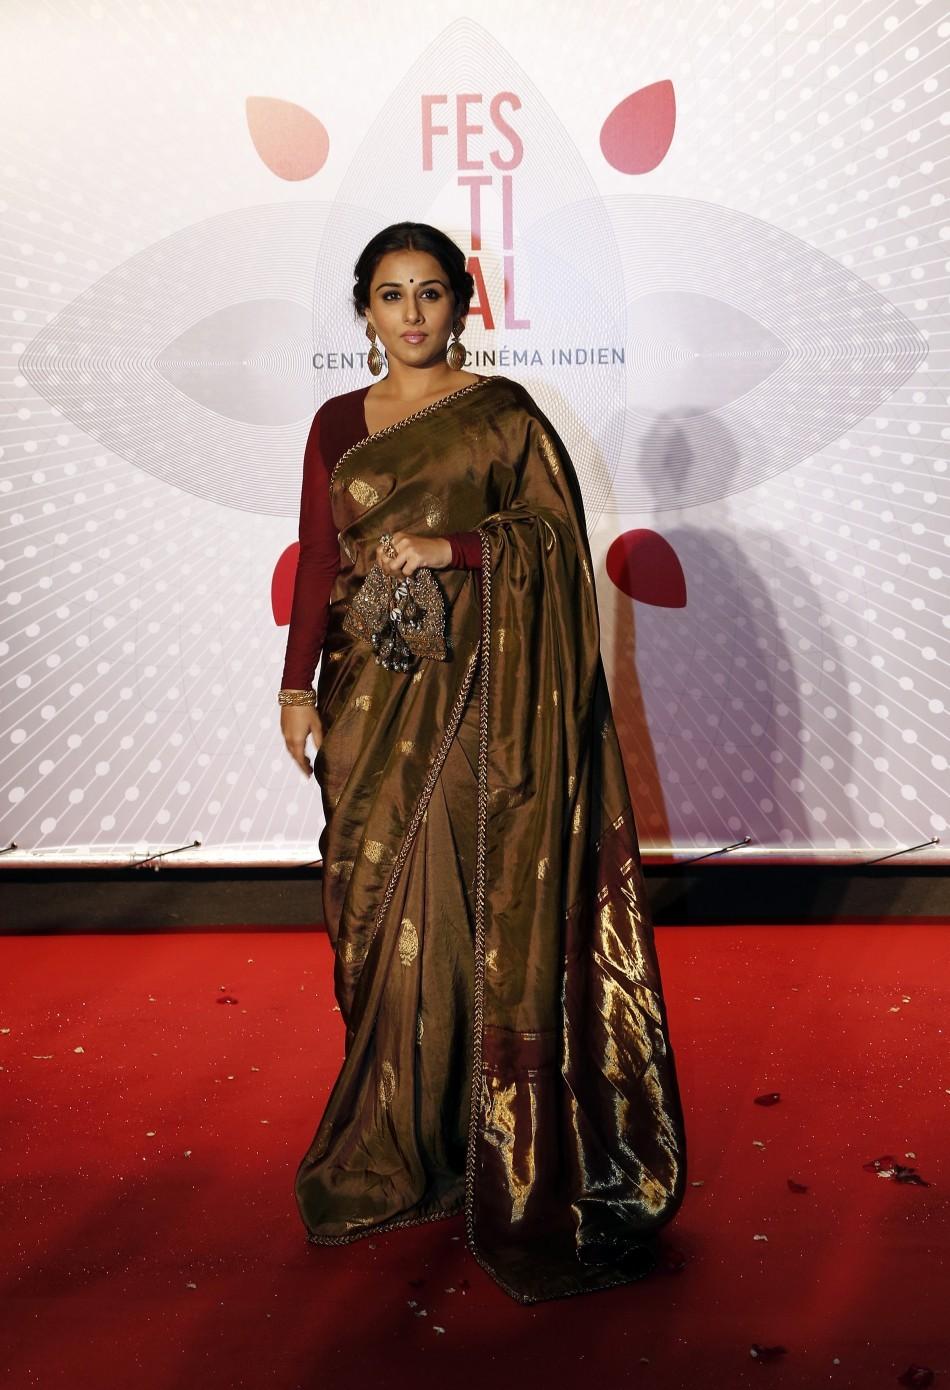 Jury Member actress Vidya Balan poses as she arrives at the evening's gala of the film